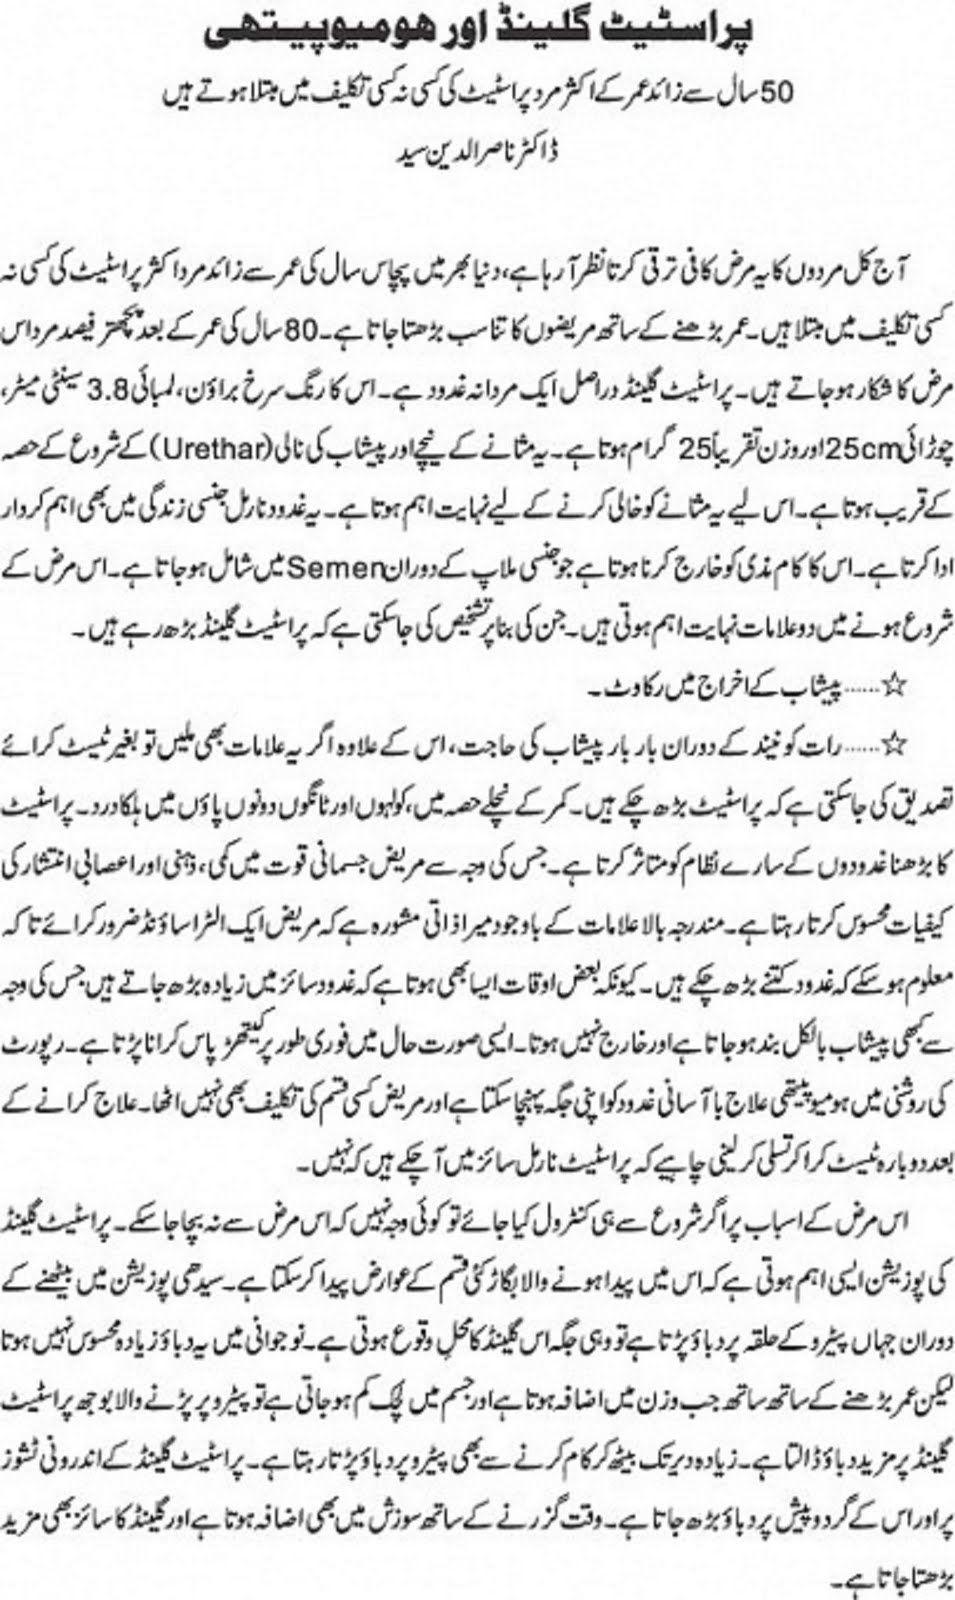 Image result for homeopathic medicine list in urdu Essay